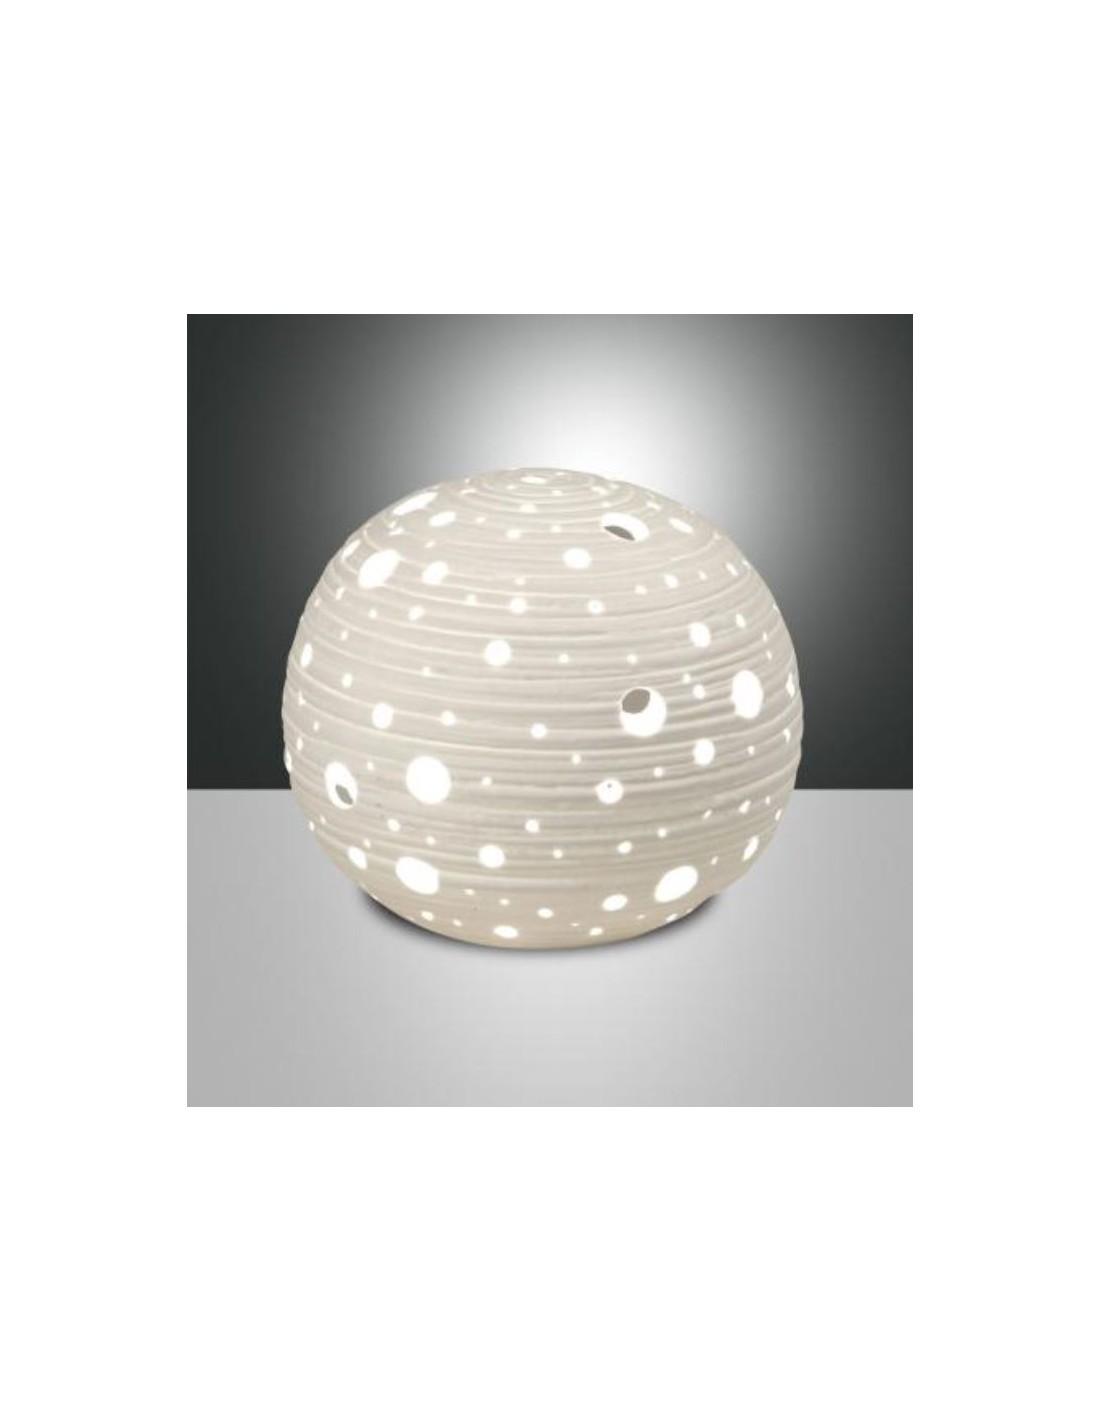 Lampada Da Tavolo In Ceramica Corvara Bianca 3531 30 102 Fabas Luce